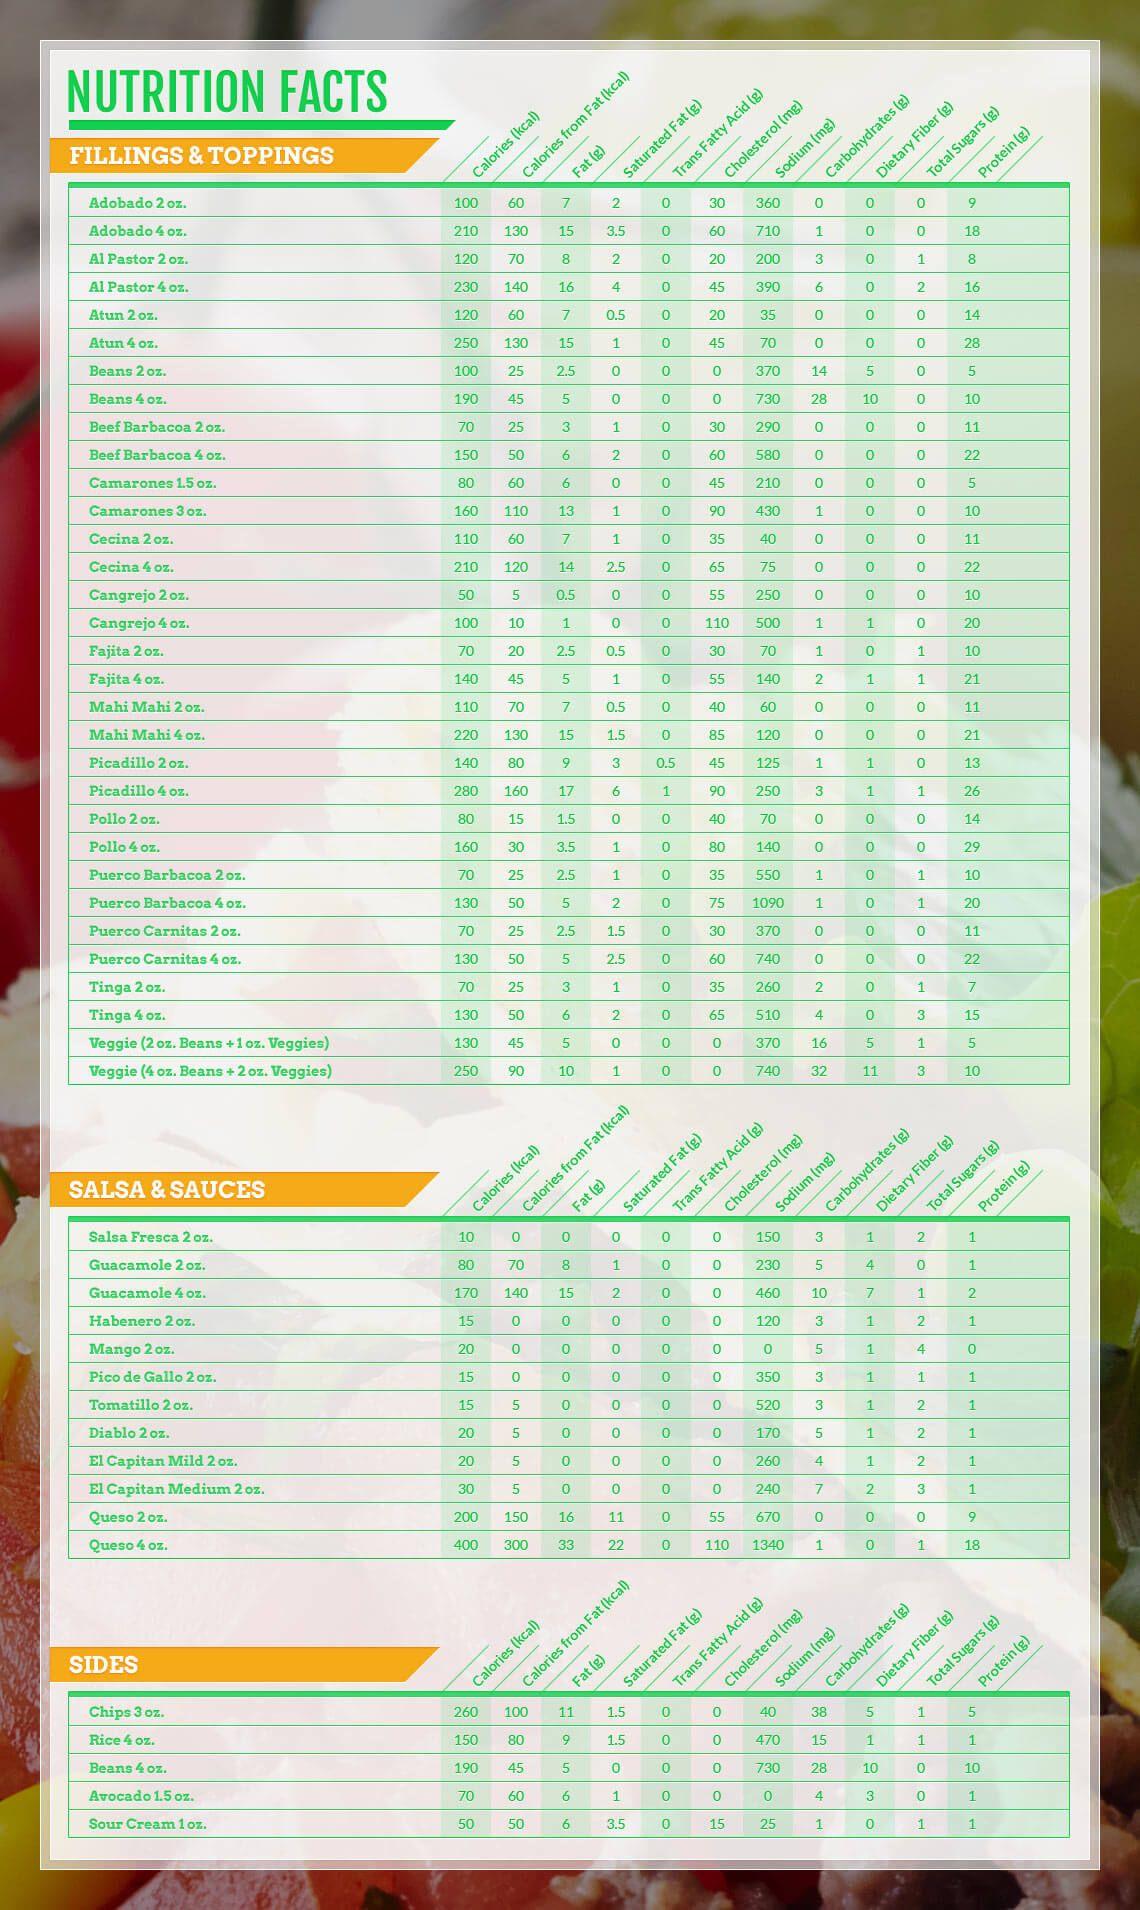 yolandas_infographic2.jpg